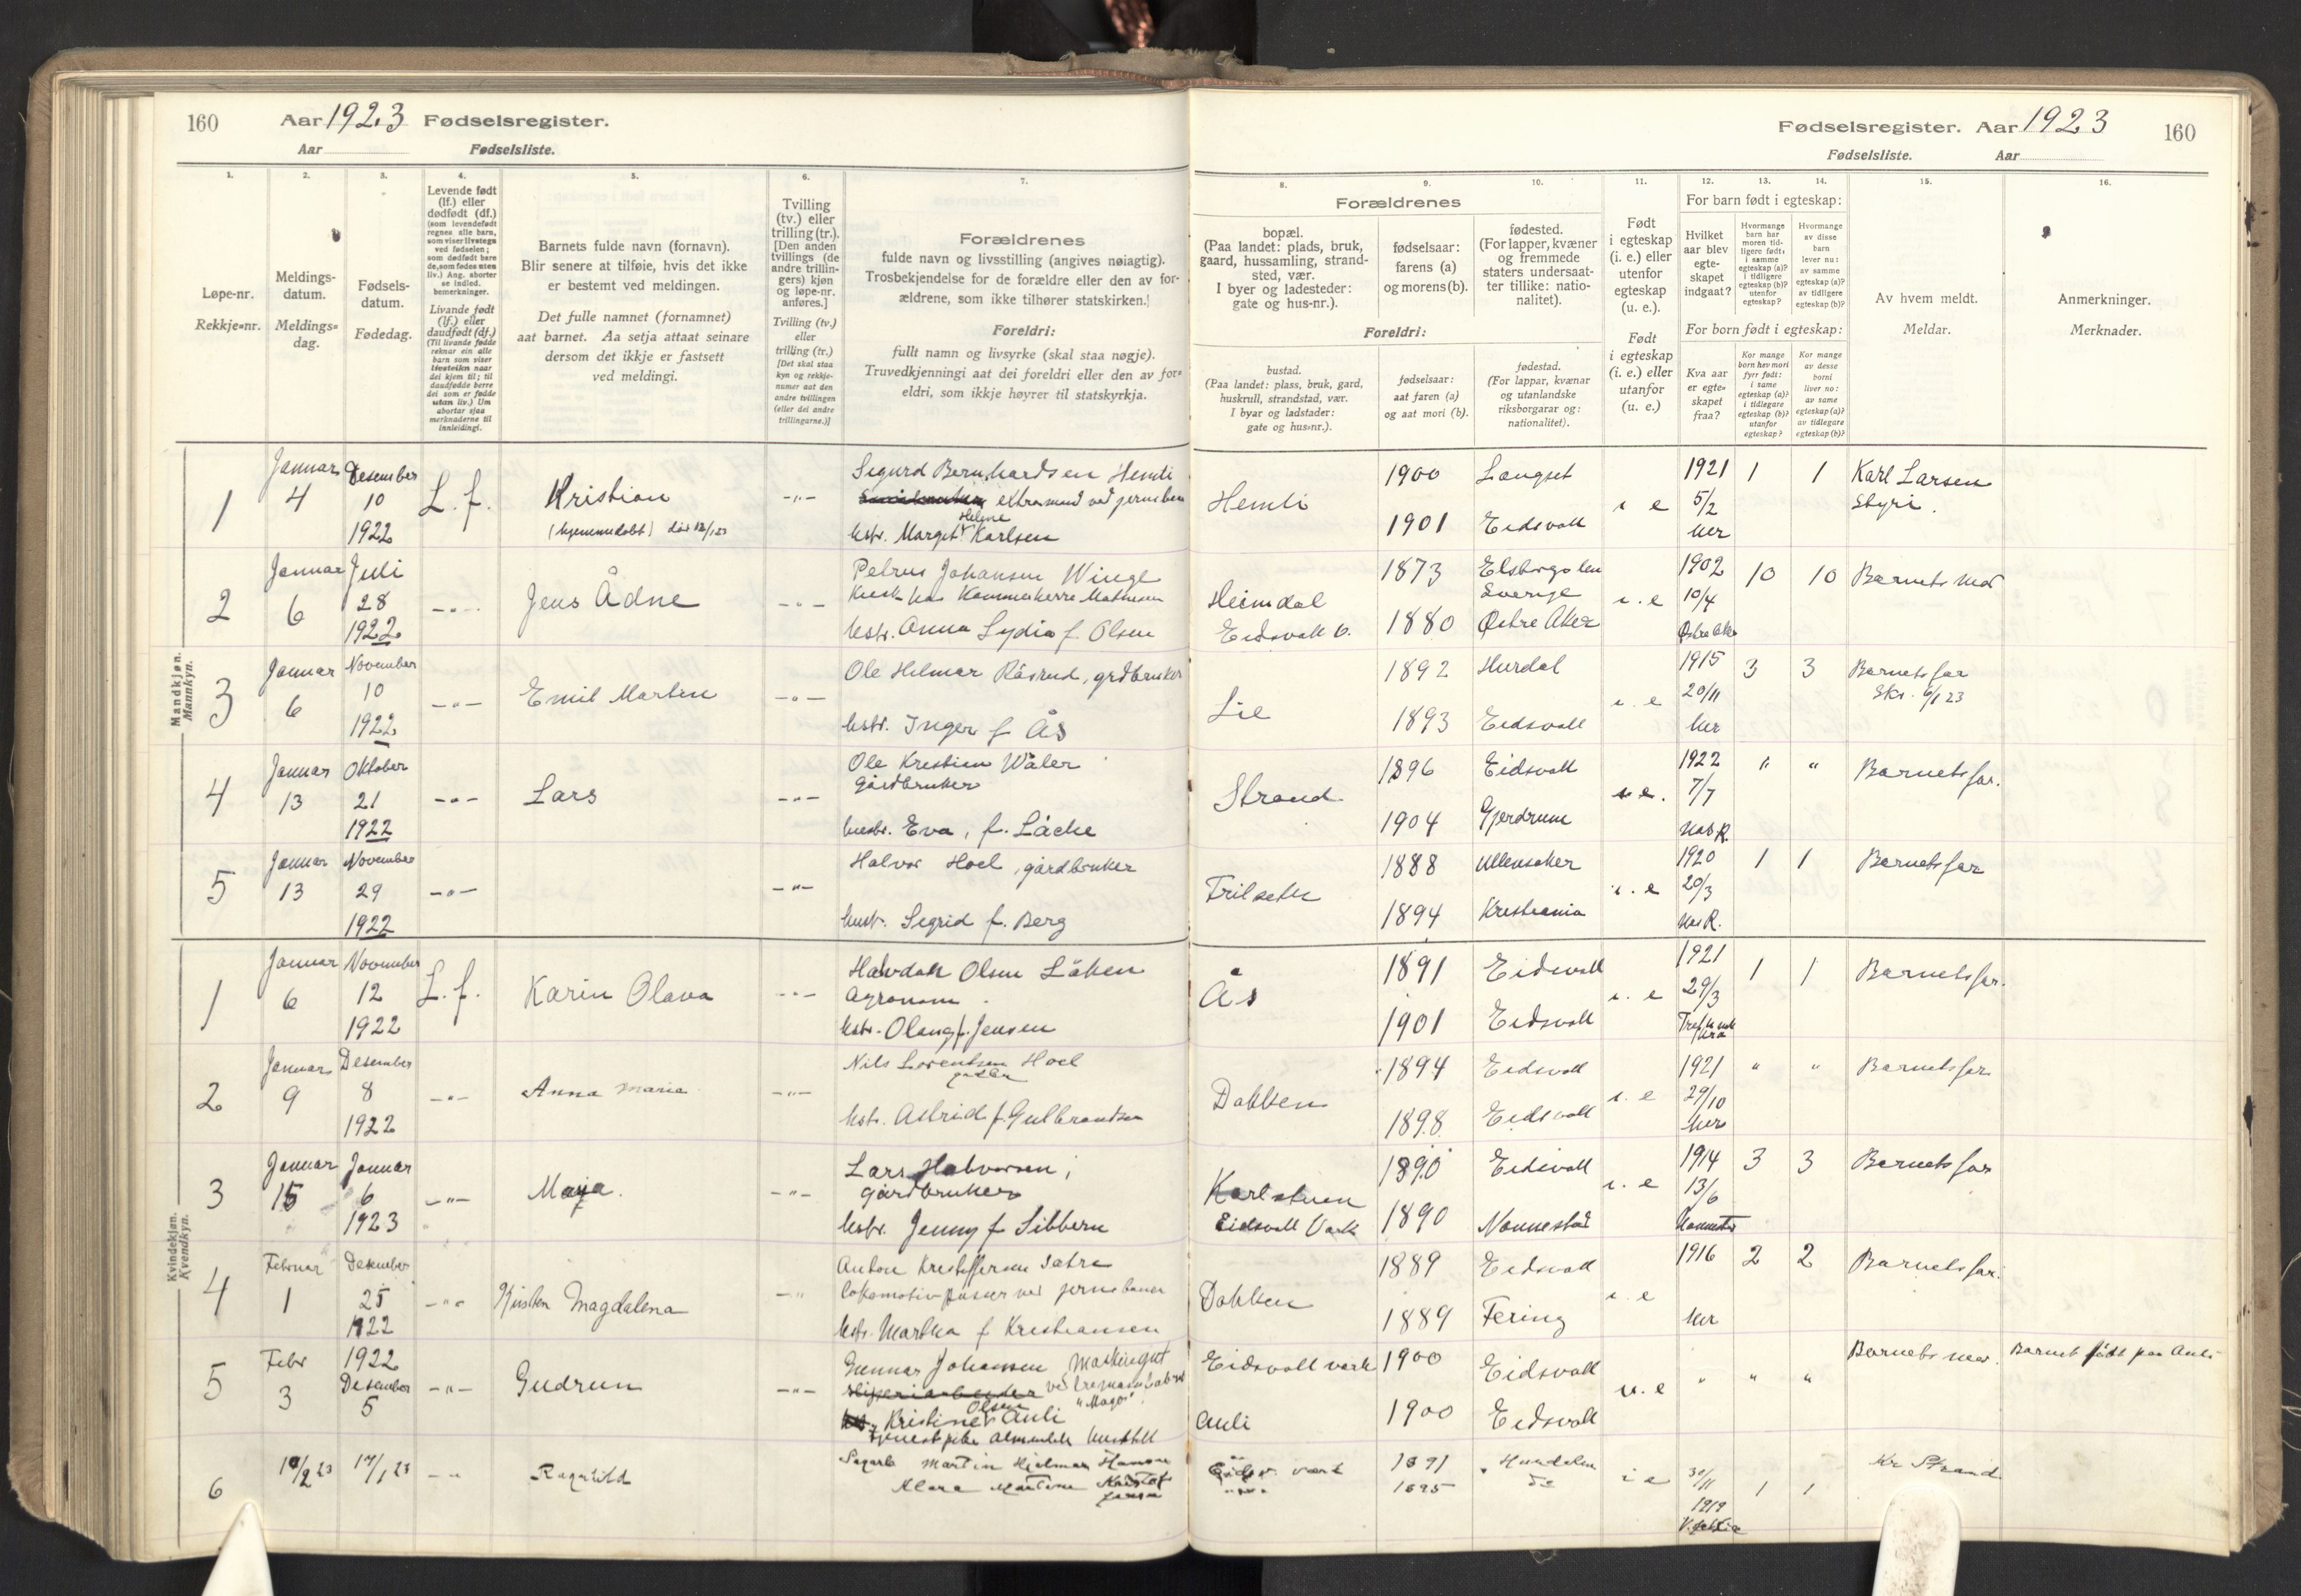 SAO, Eidsvoll prestekontor Kirkebøker, Birth register no. I 1, 1916-1924, p. 160